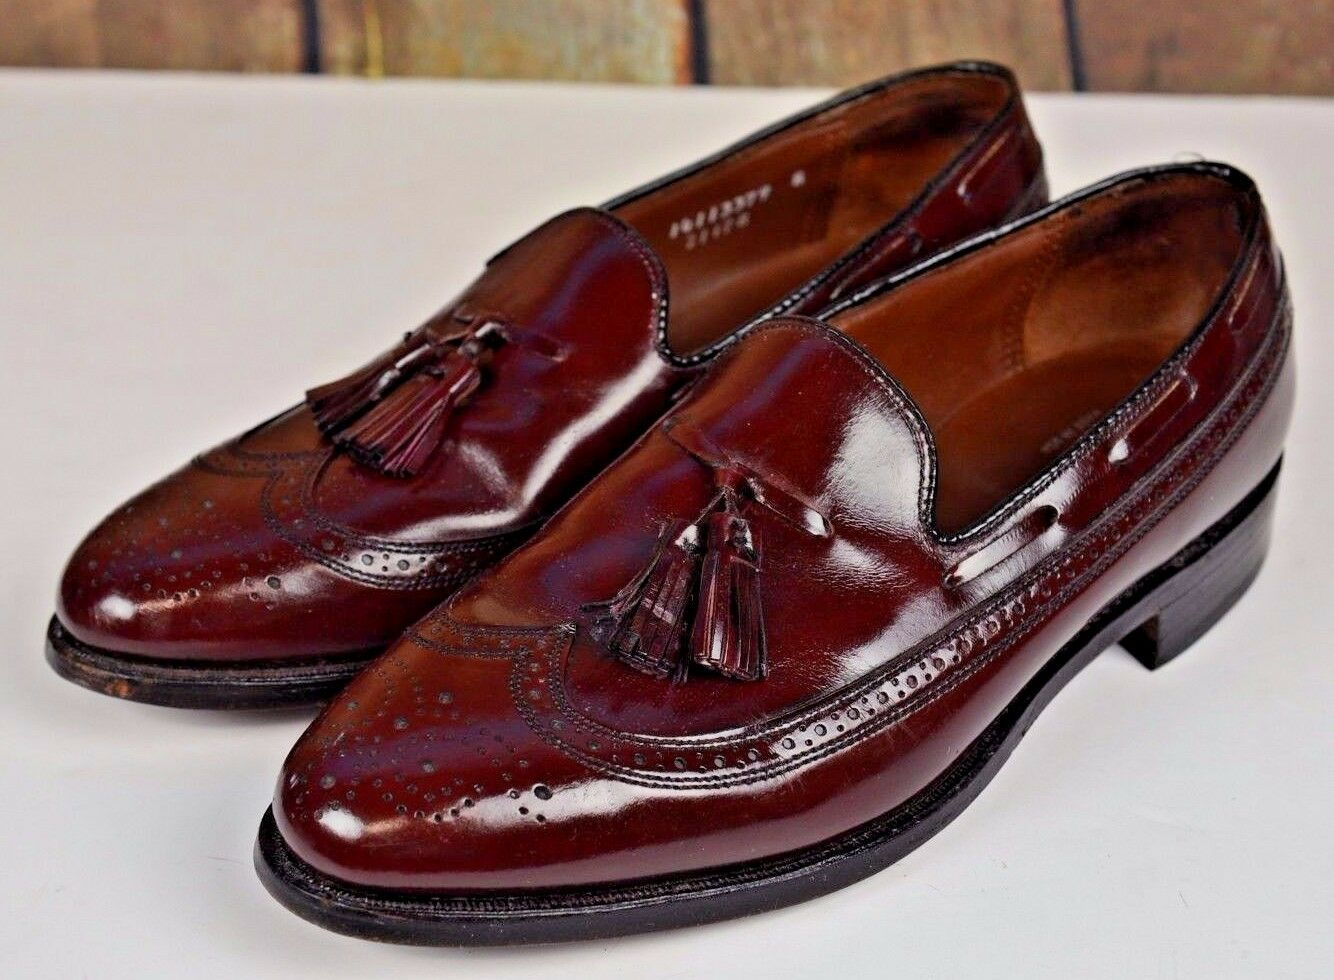 Bostonian XL Men's Tasseled Wing Tip Loafers Size 9 Slip On Burgundy Career Law